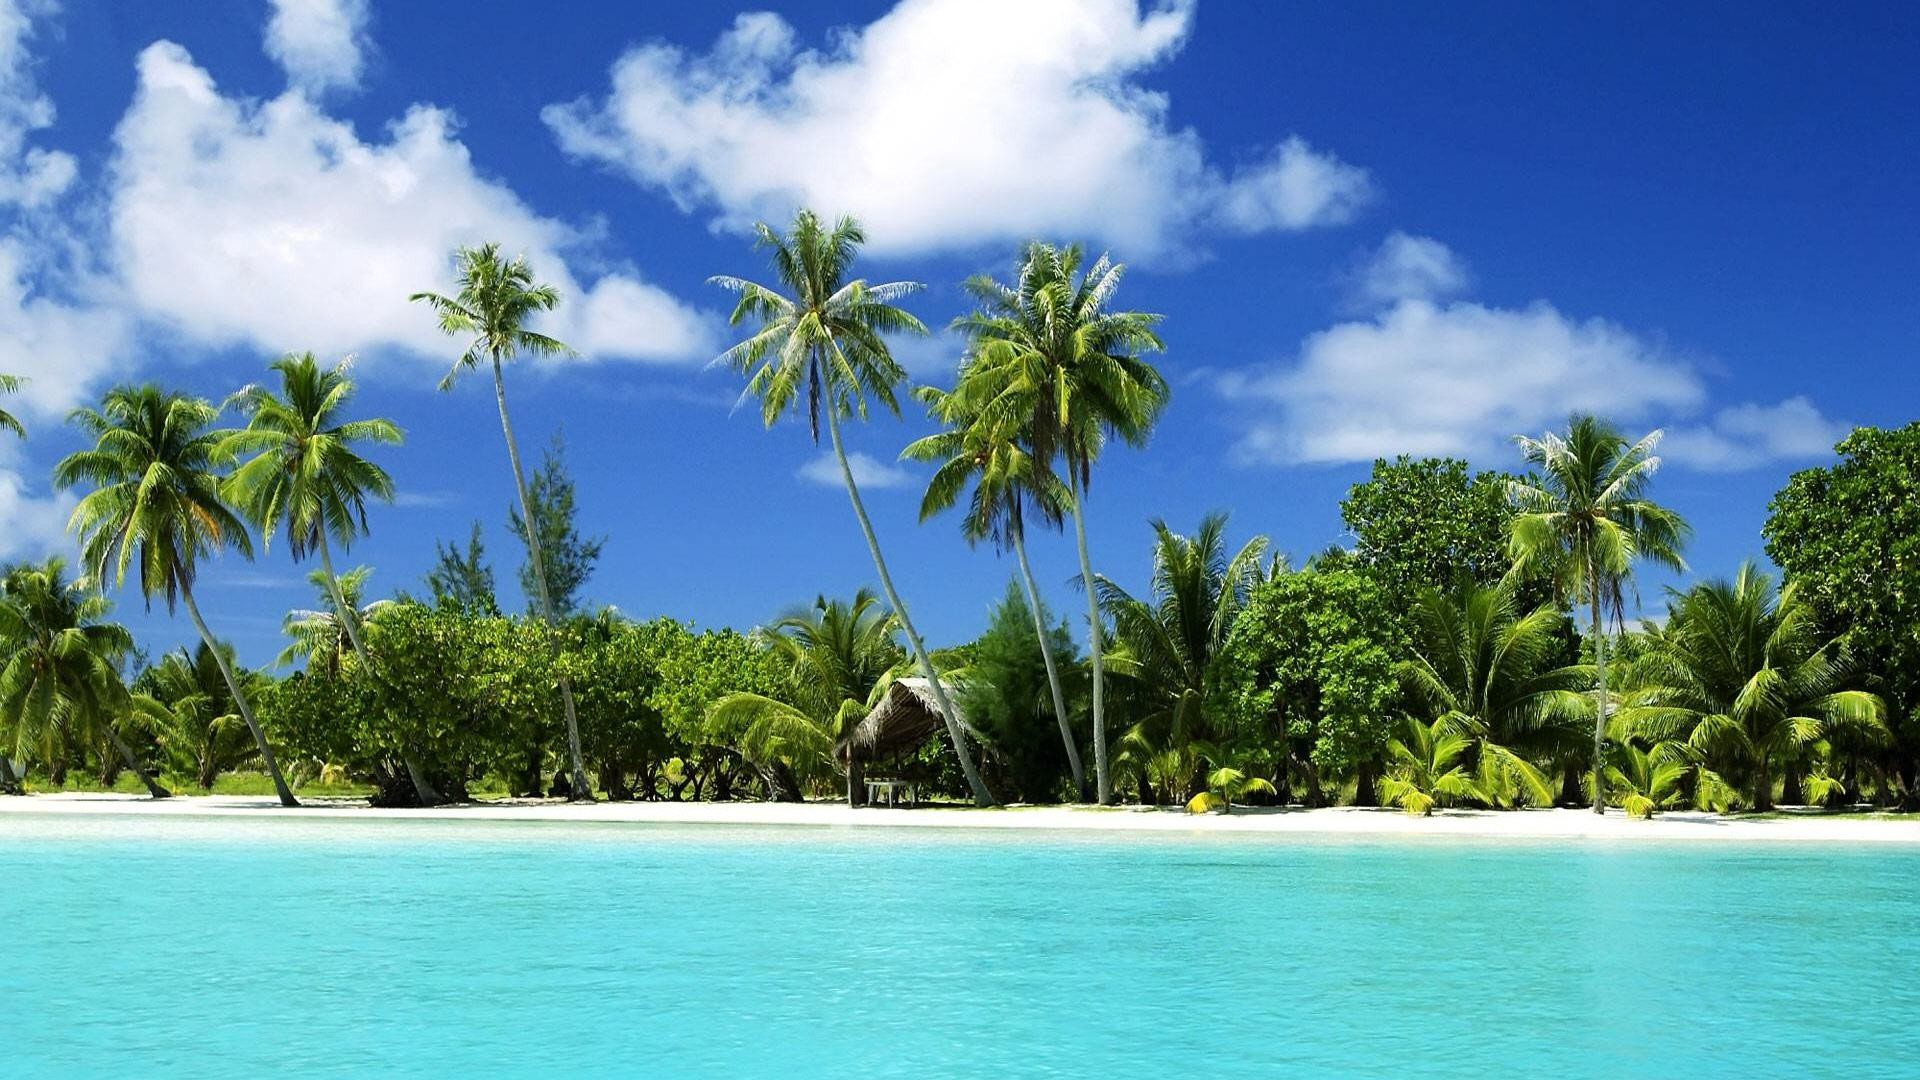 beautiful beaches wallpaper   Tropical Beaches Beautiful Beach 1920x1080px  Wallpapers #beautiful # .